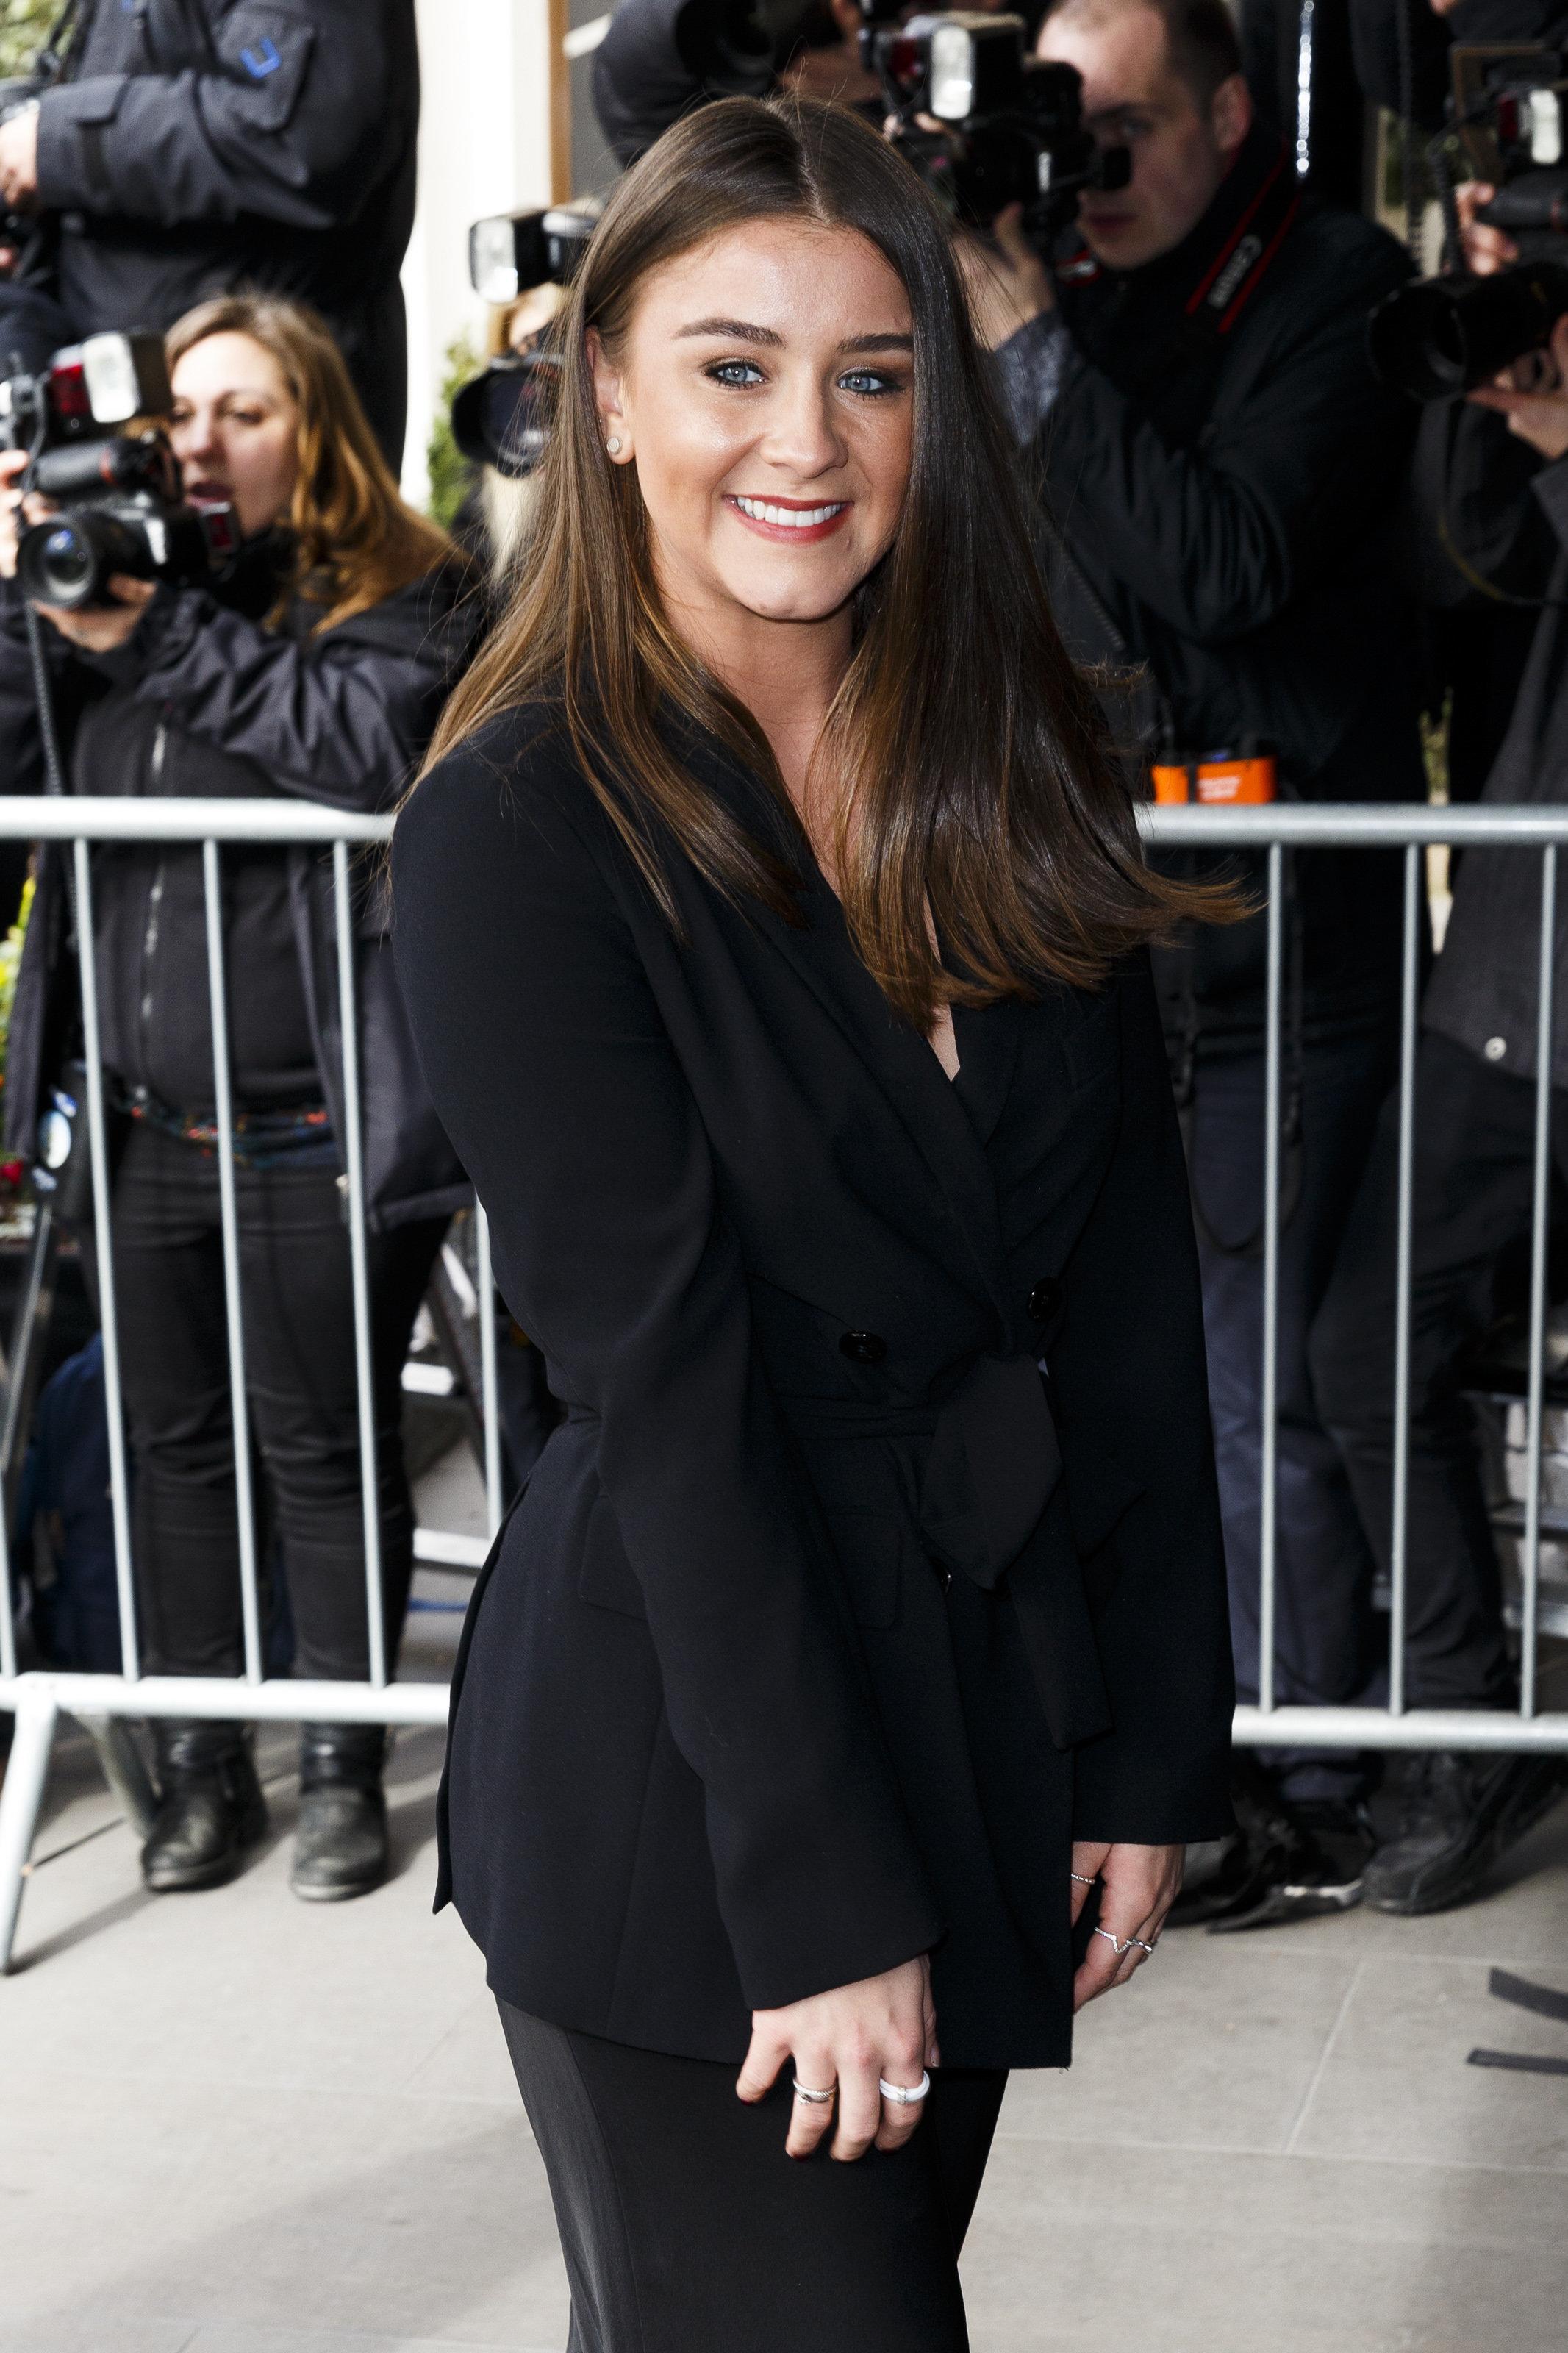 'Corrie' Star Brooke Addresses Cast Shake-Up Rumours